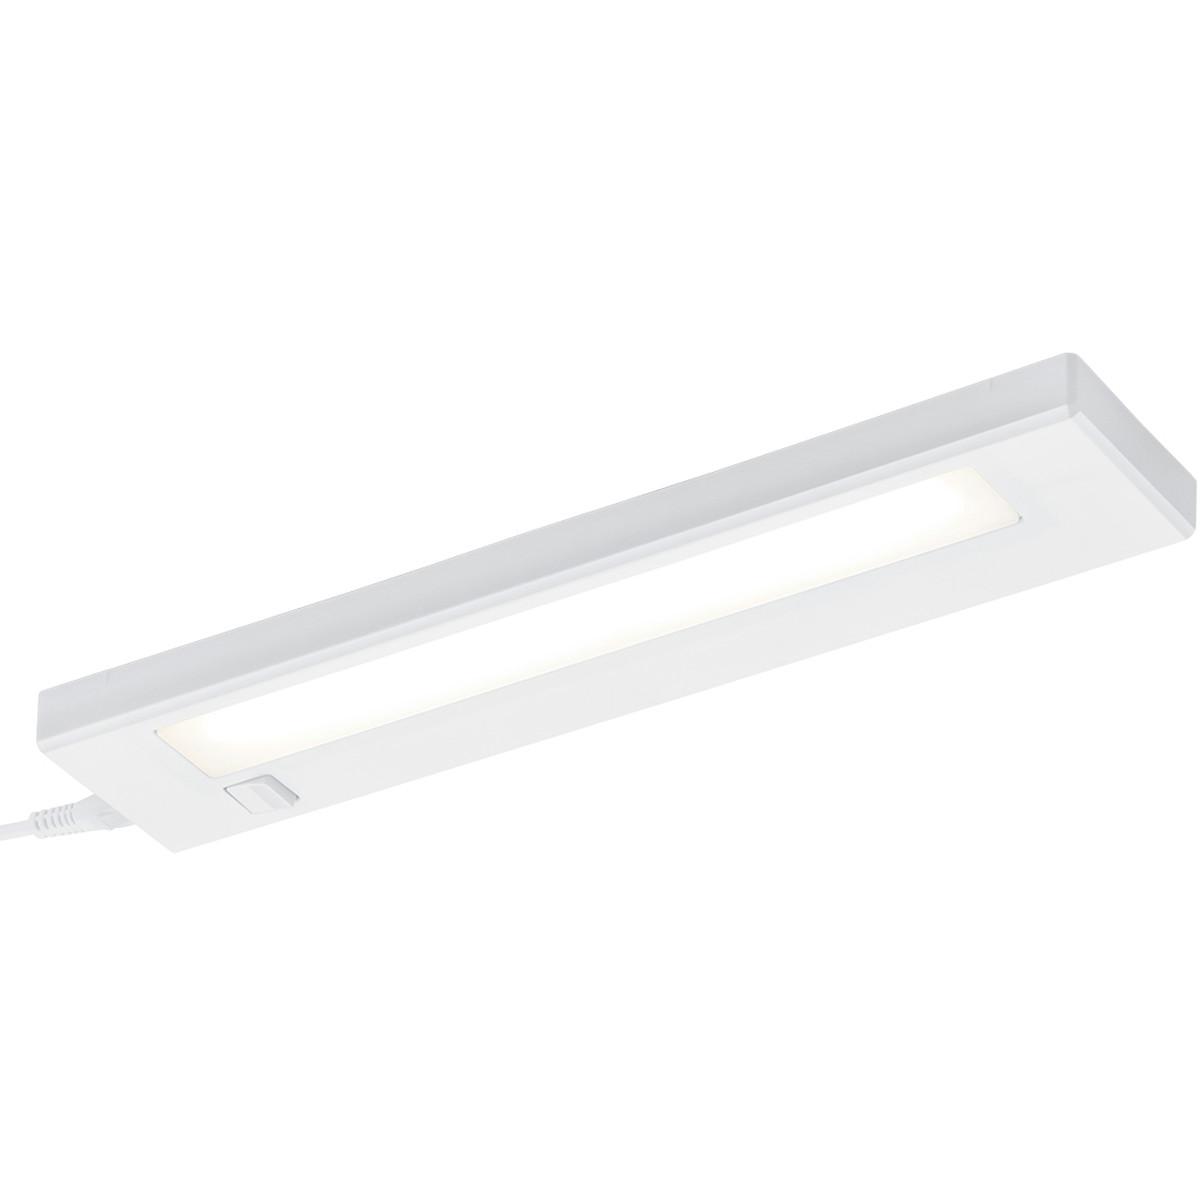 LED Keukenkast Verlichting - Trion Alyna - 4W - Warm Wit 3000K - Rechthoek - Mat Wit